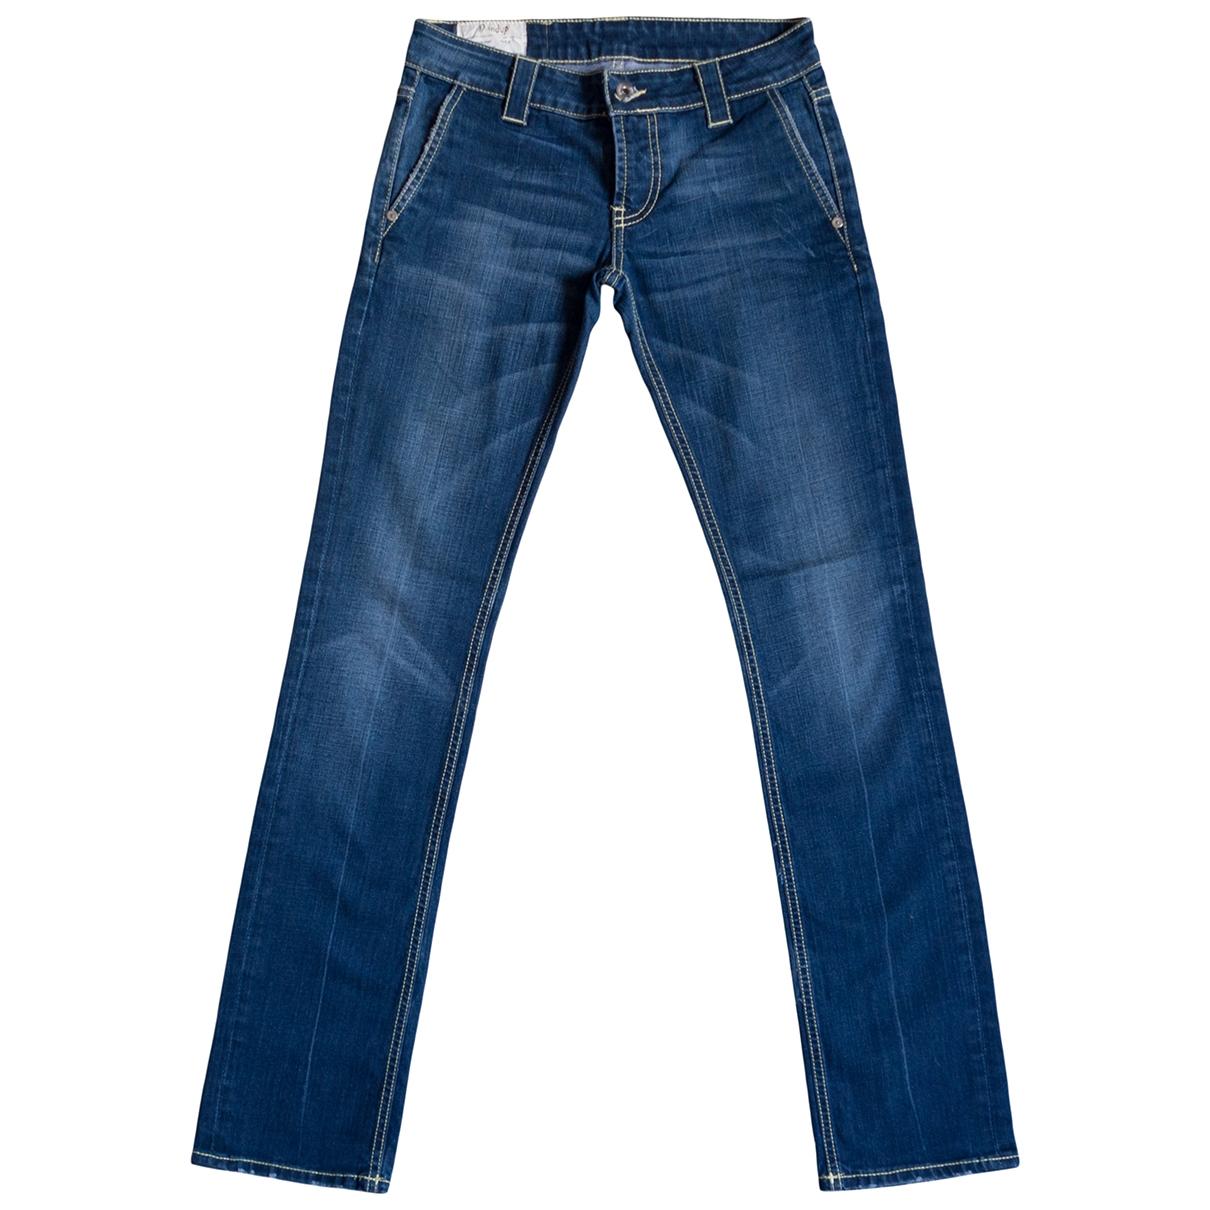 Dondup \N Blue Denim - Jeans Jeans for Women 25 US